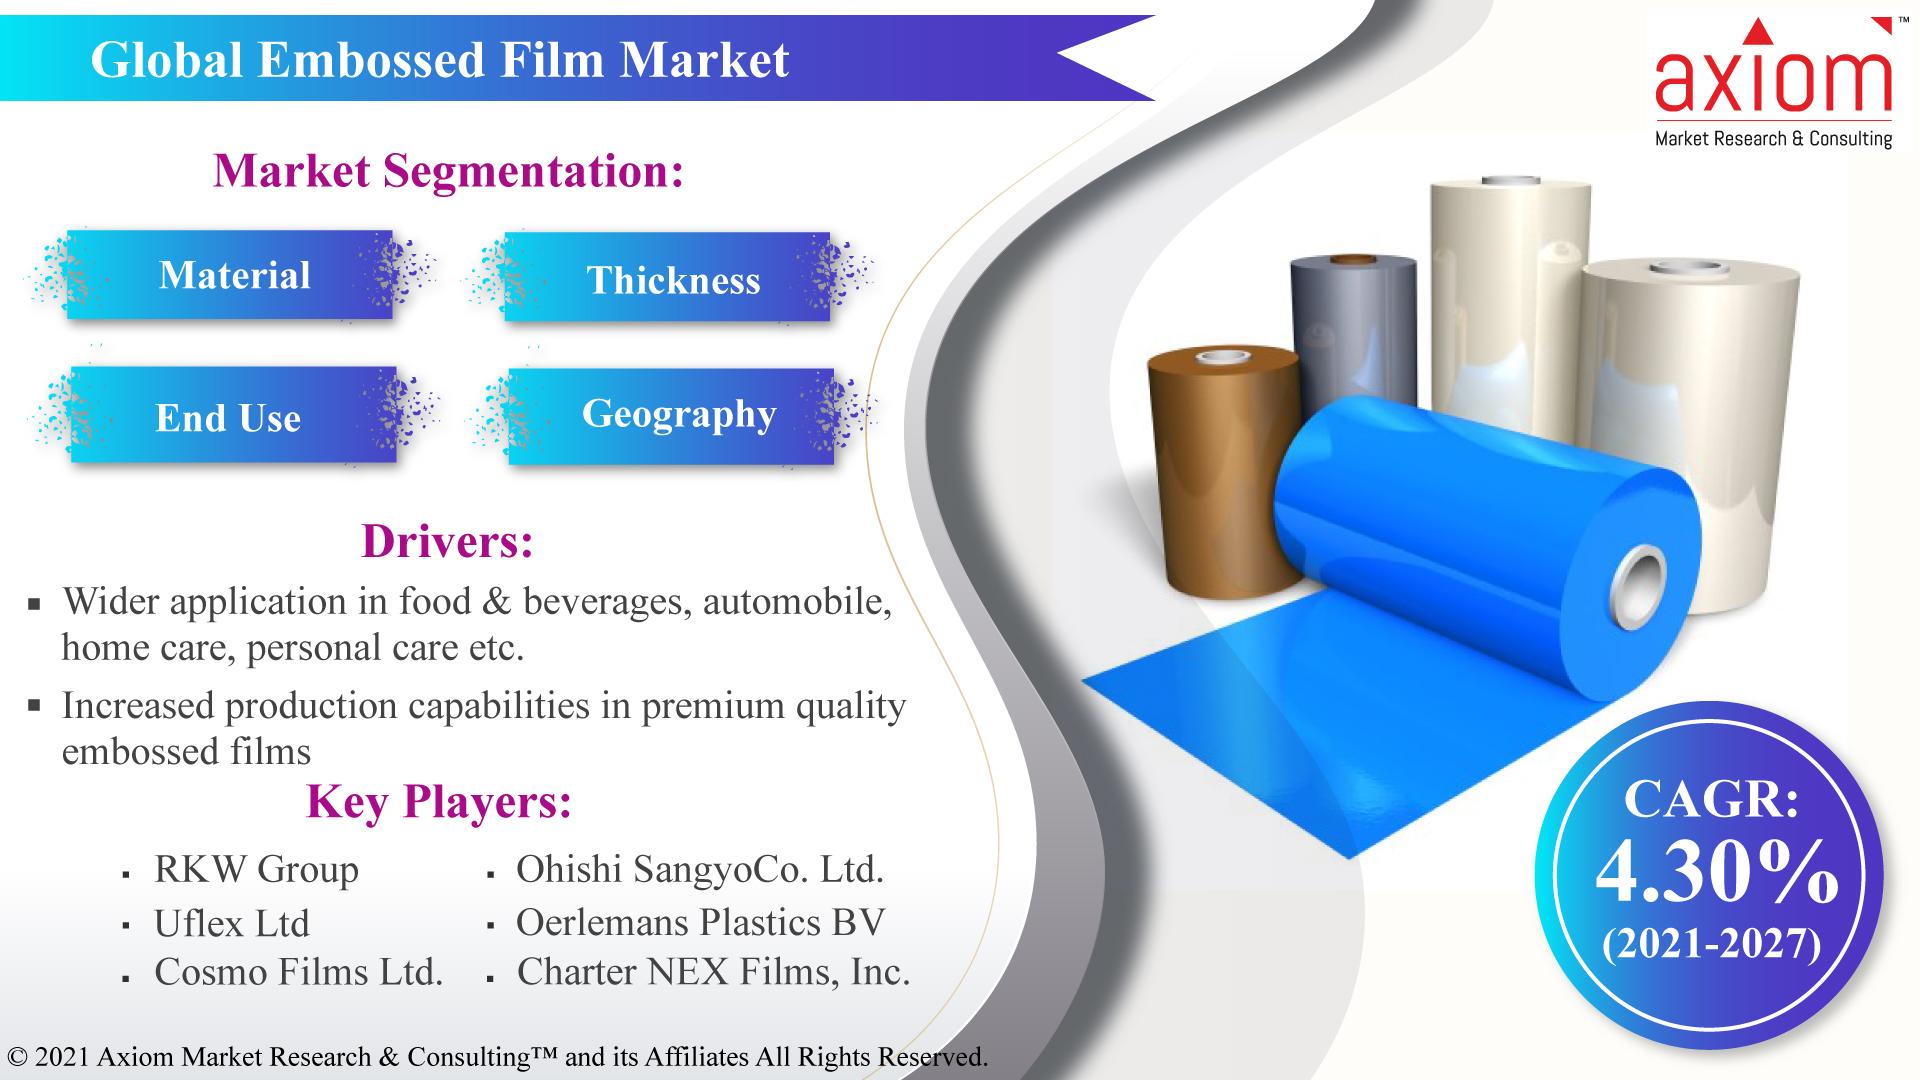 Global-Embossed-Film-Market